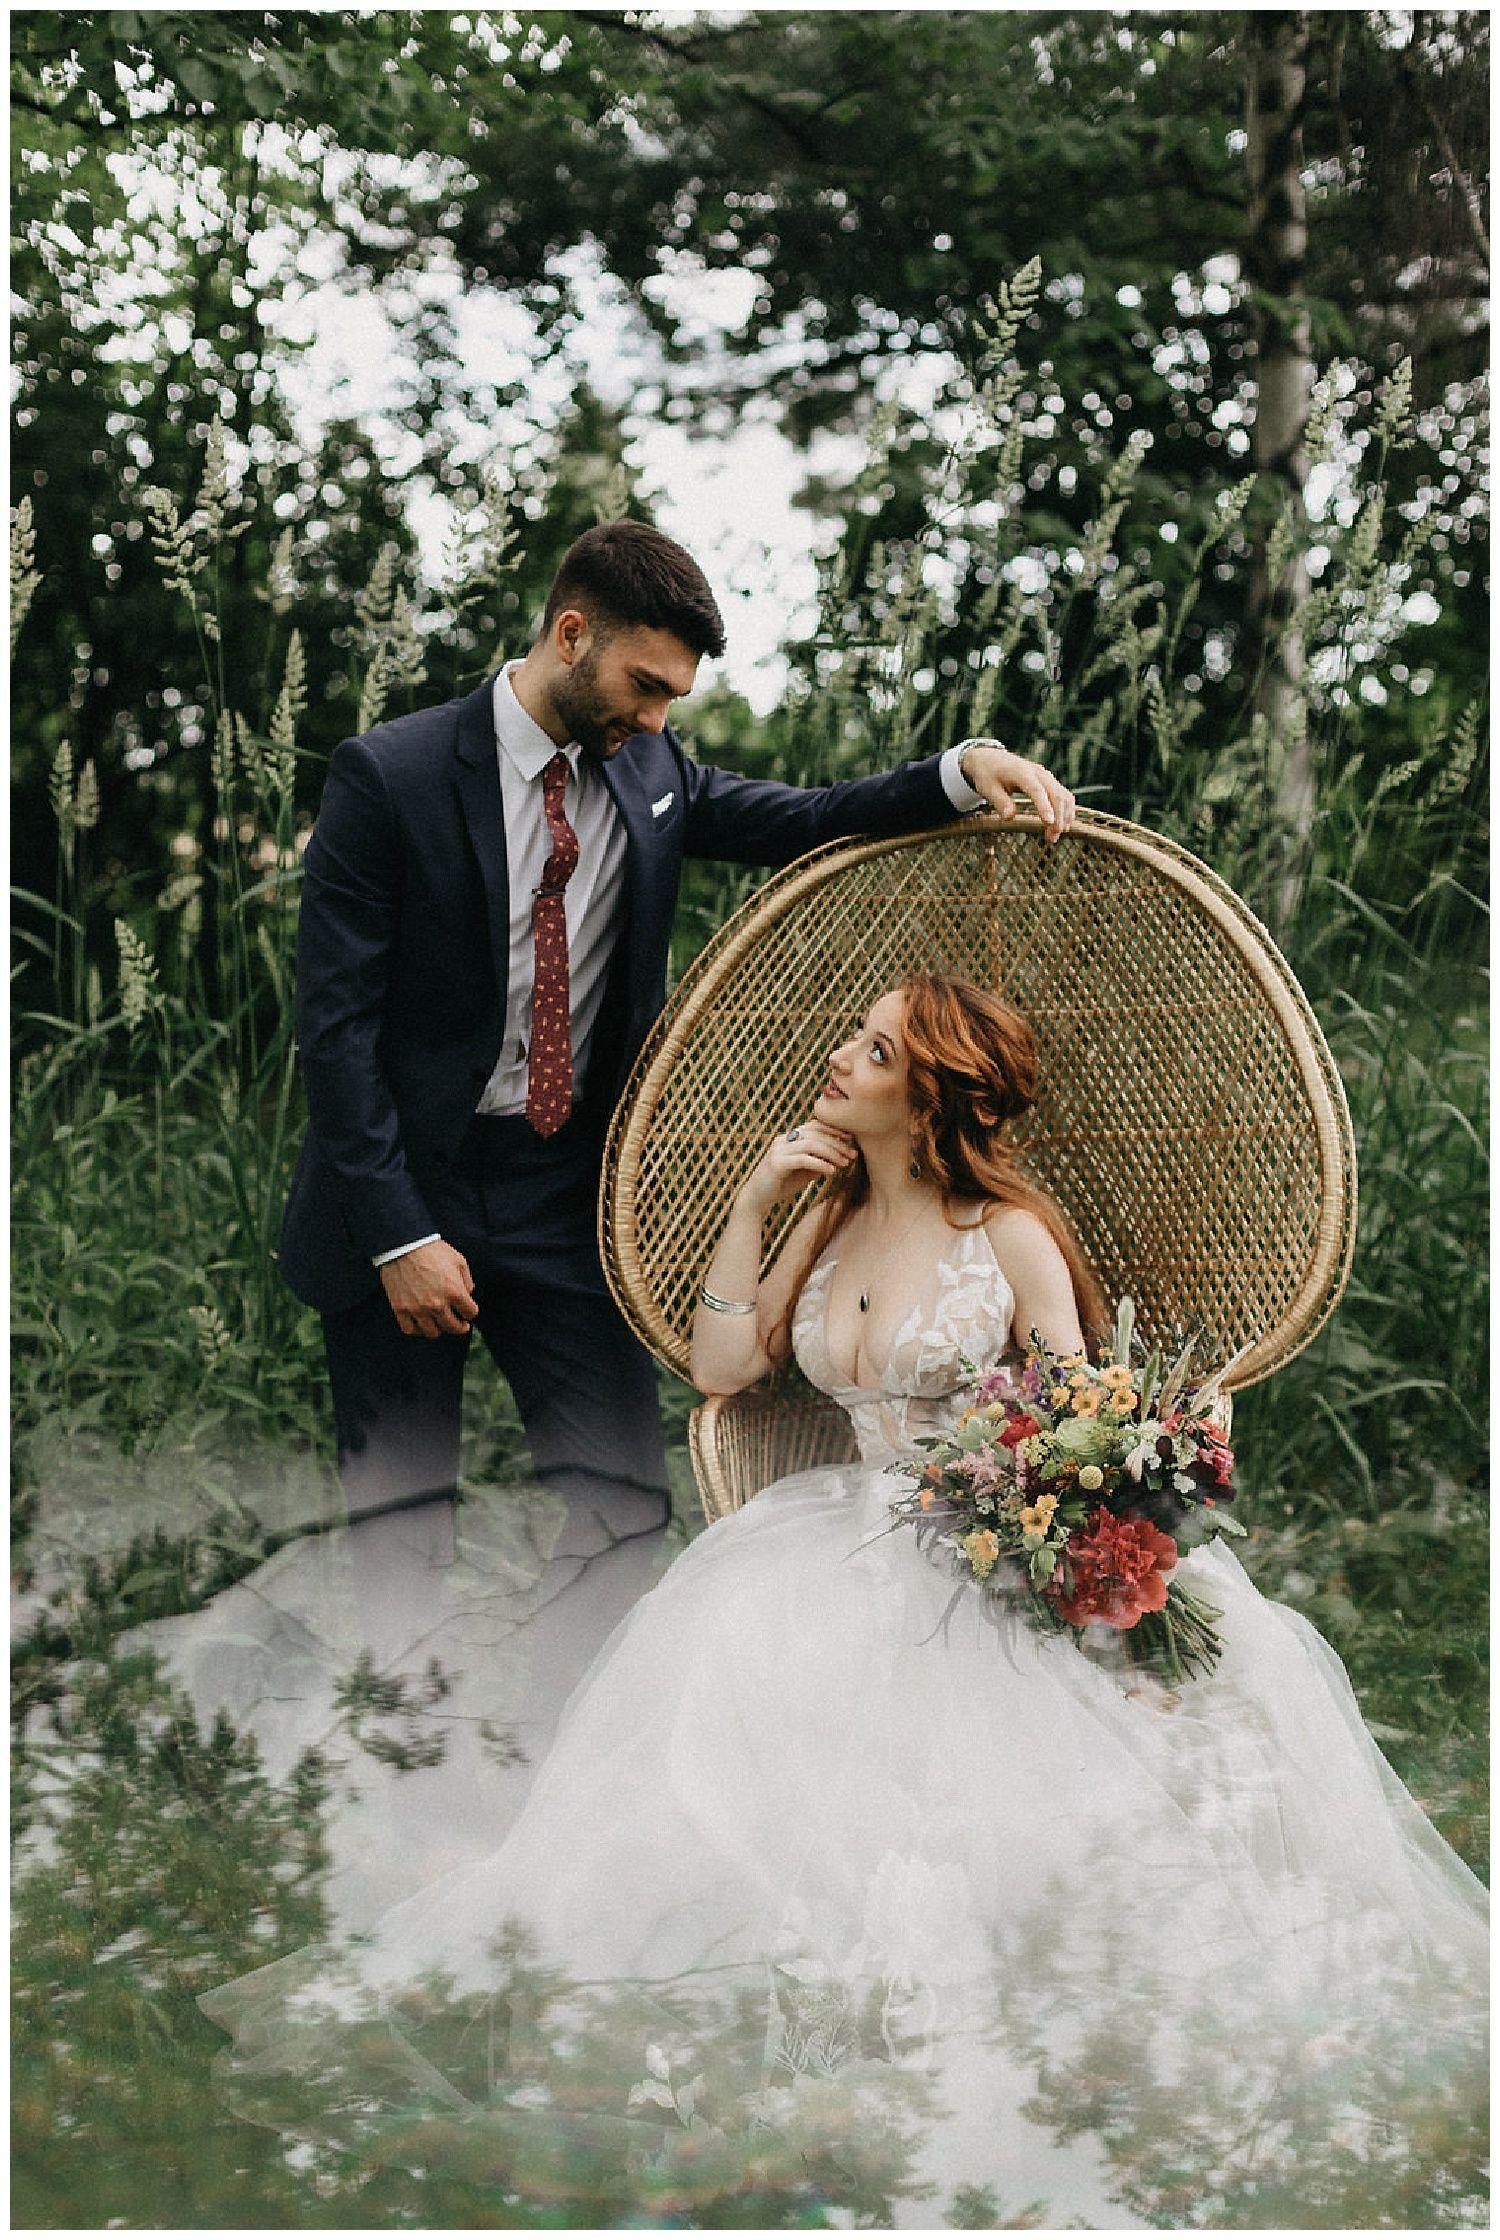 Vintage boho wedding inspiration at aster weddings u hannah